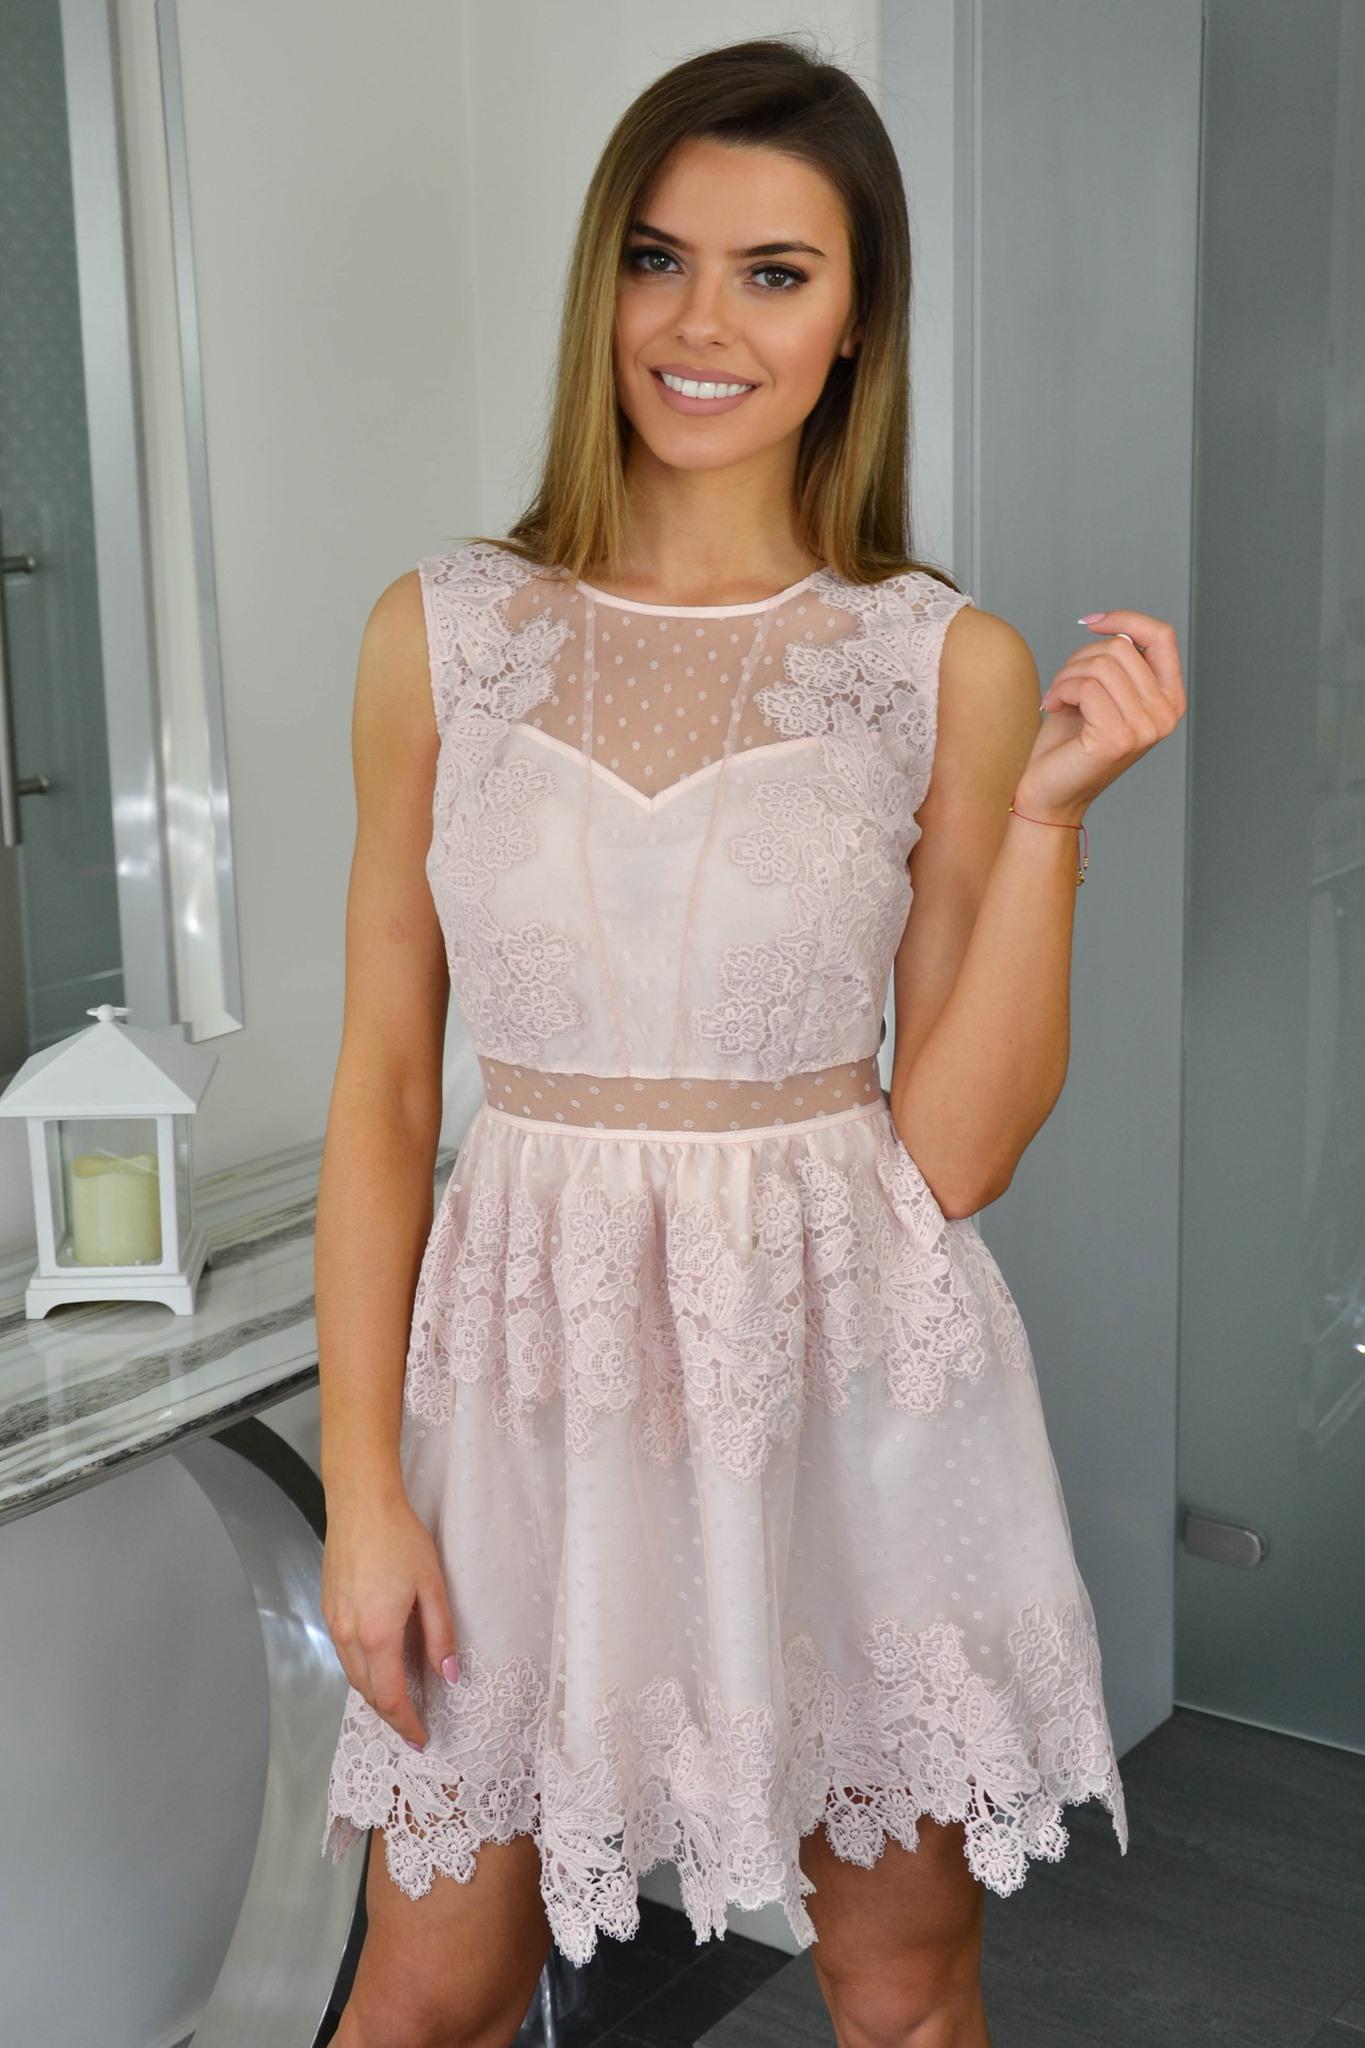 damske saty,dámske šaty,elegantné šaty,koktejlové šaty, koktejlove saty, čipkované šaty, šaty na svadbu,letné šaty, letne saty,šaty na leto, ružové šaty, večerné šaty,spoločenské šaty